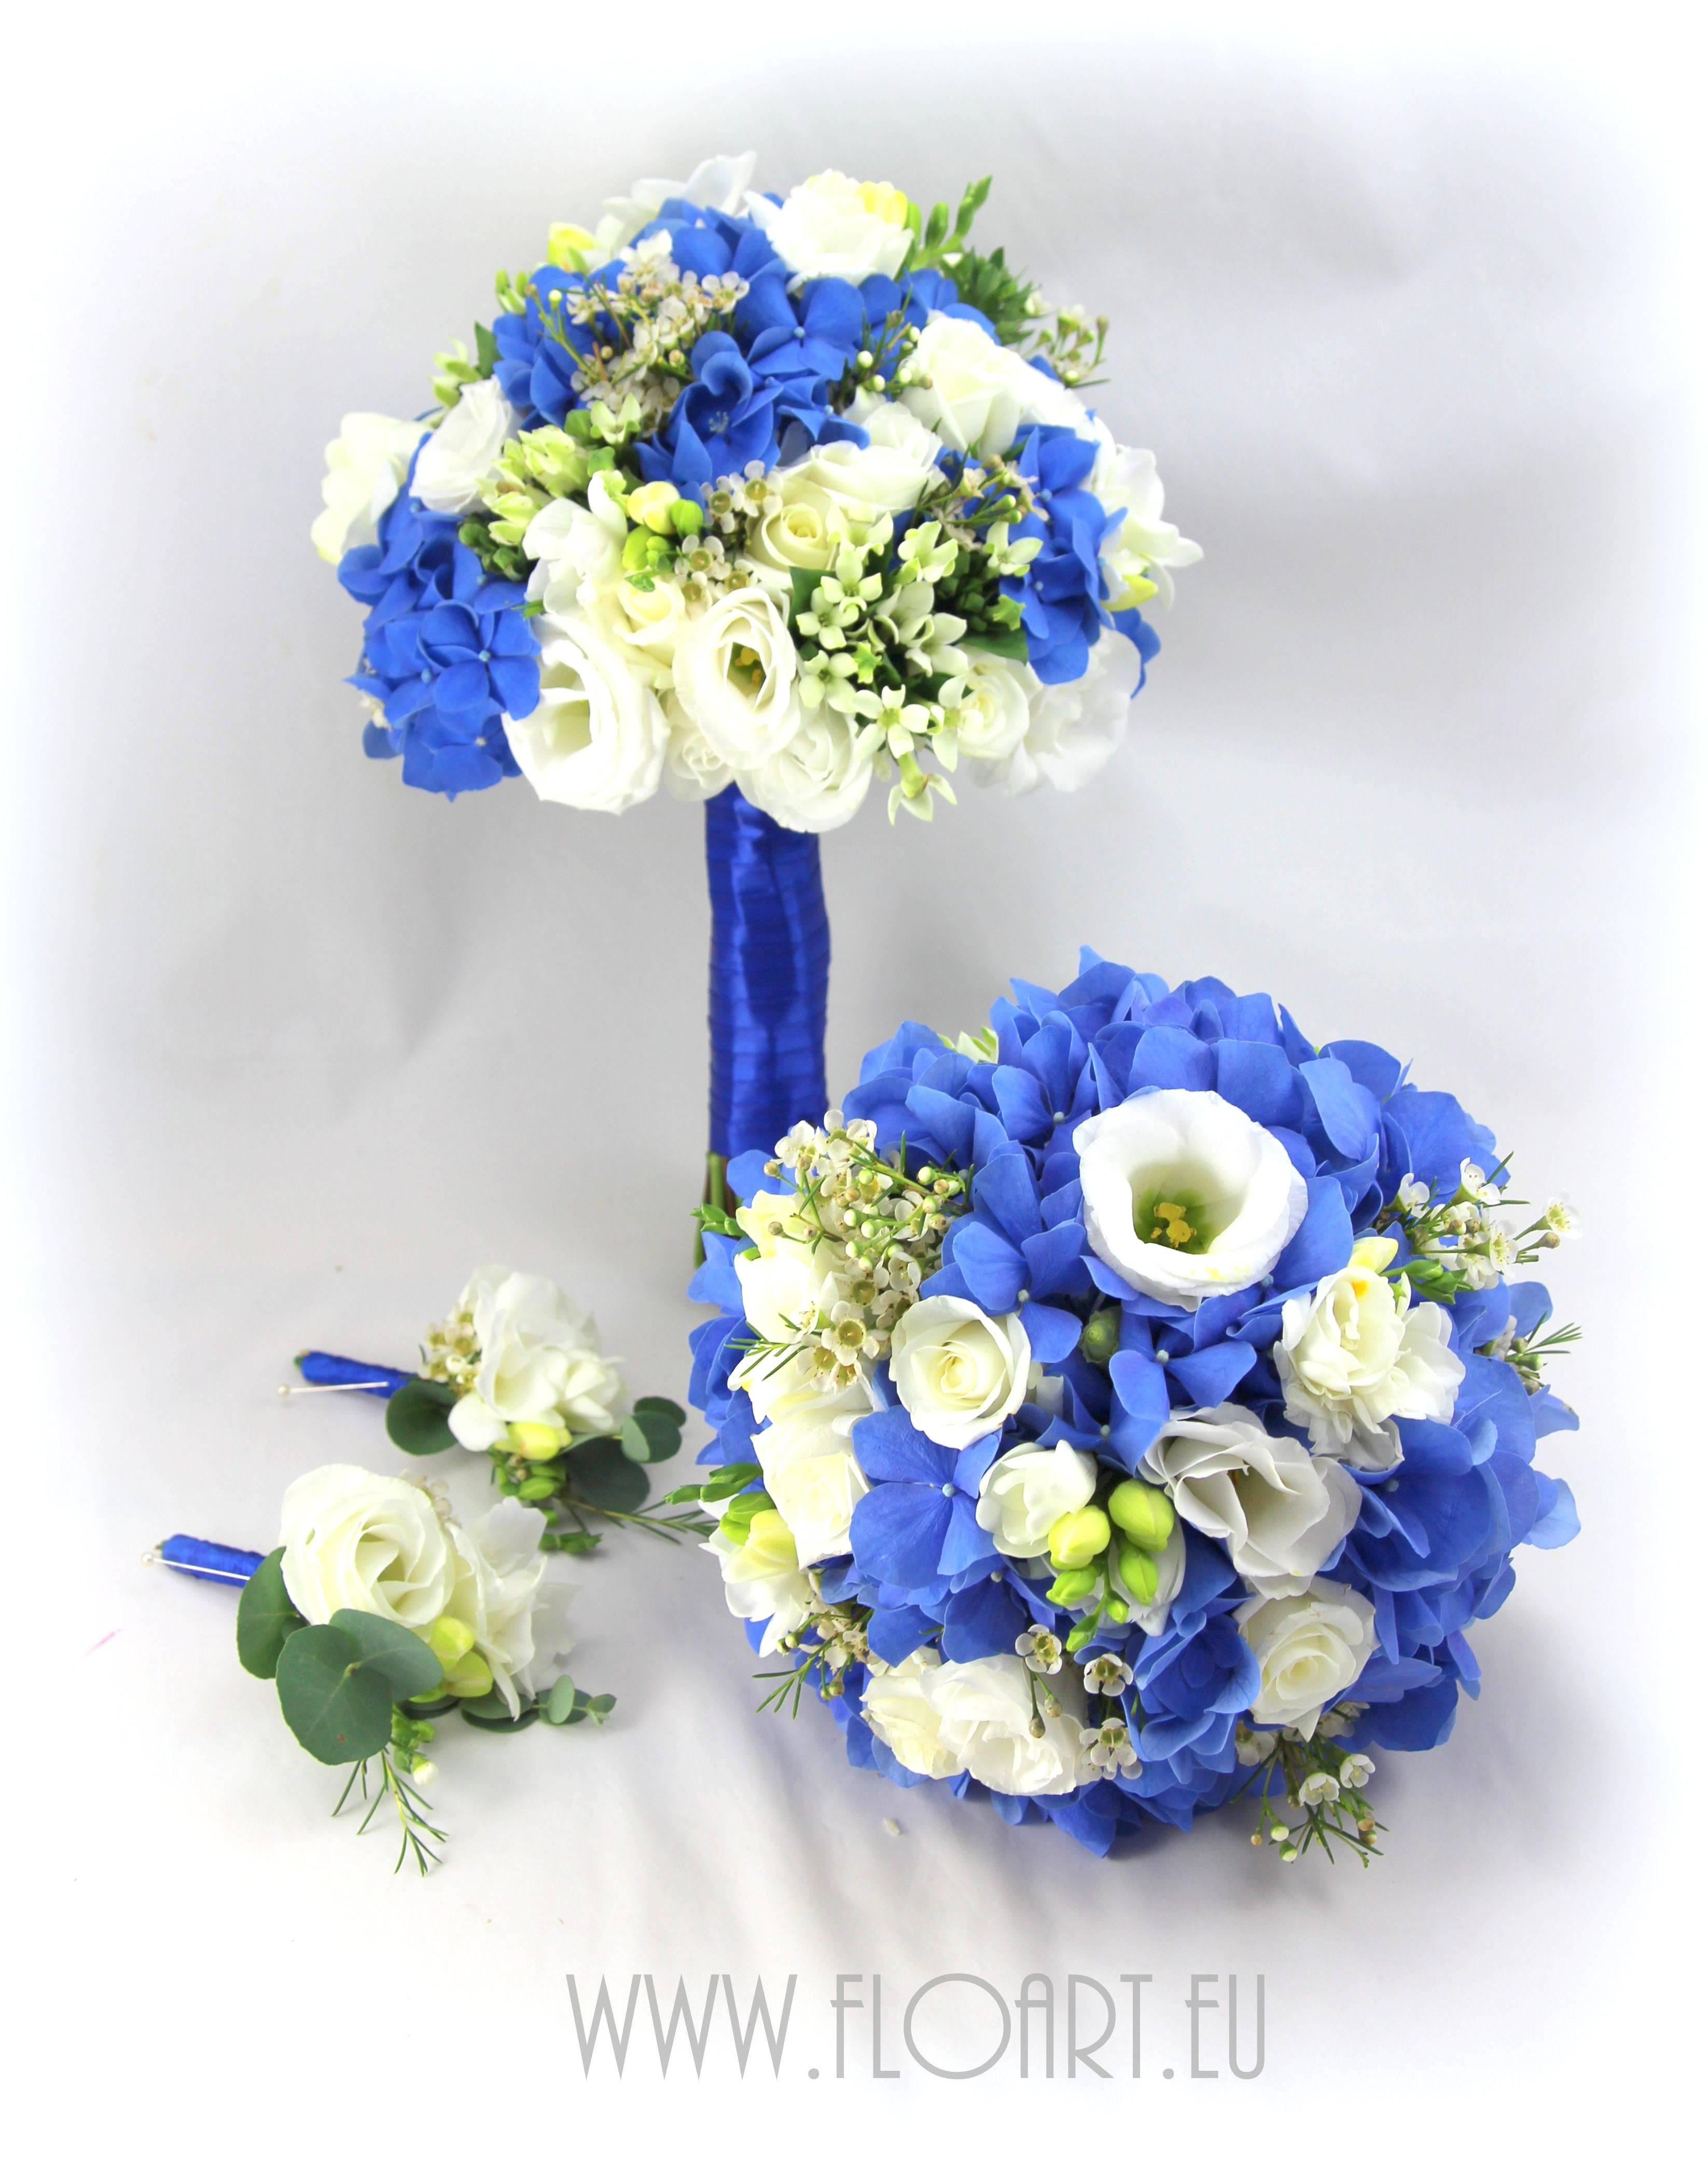 cobalt blue bud vase of cobalt blue wedding decor minimalist bukiet od floart kwiaty inside cobalt blue wedding decor minimalist bukiet od floart kwiaty kwiatysapiekne pieknekwiaty flowers